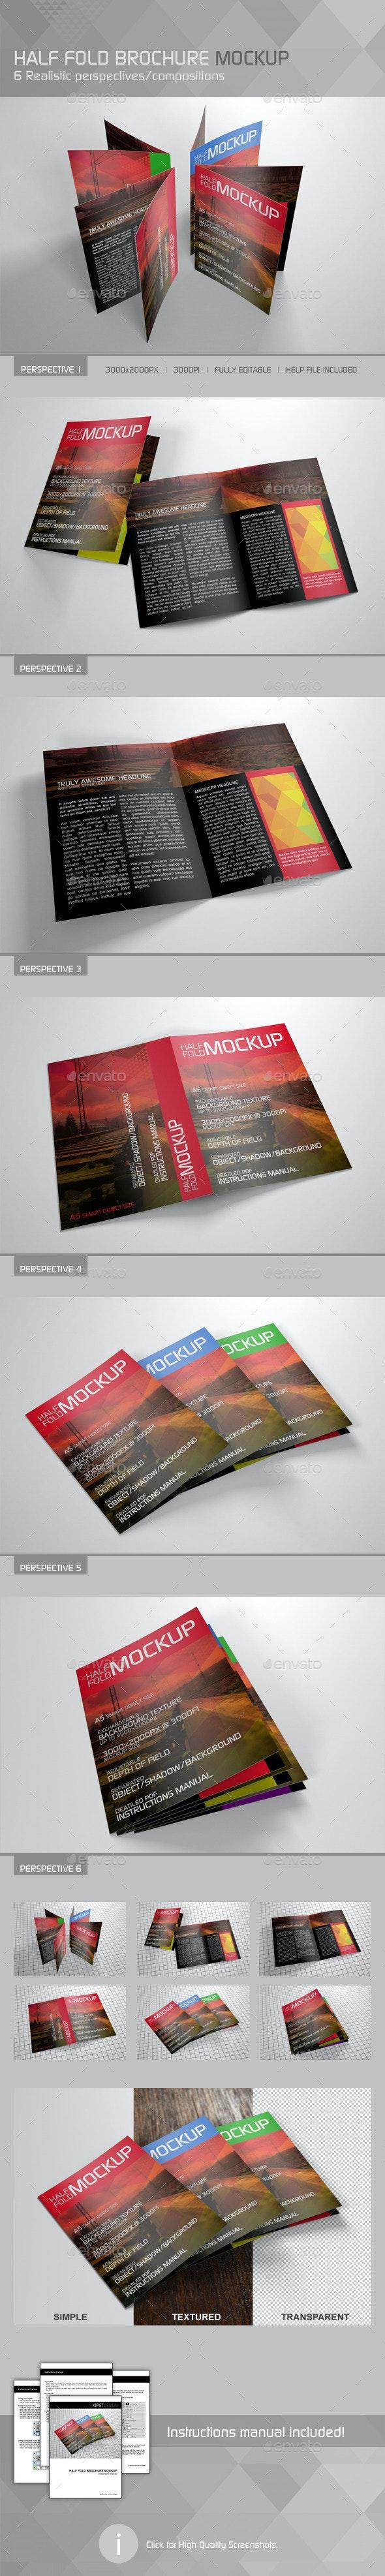 Realistic Half Fold Brochure Mockup - Brochures Print